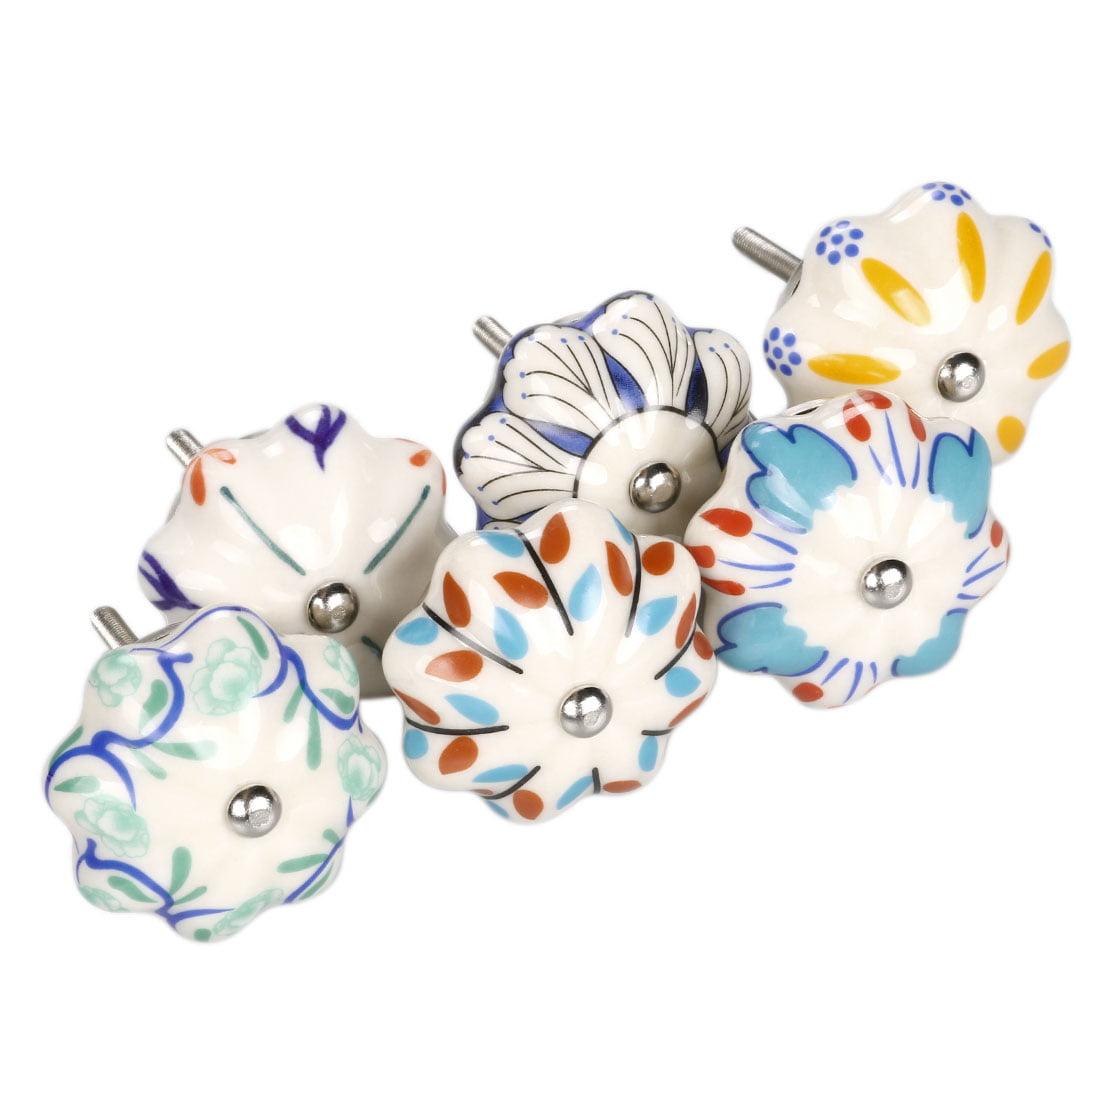 6 Pack Vintage Shabby Chic Hand Painted Ceramic Pumpkin Cabinet Knobs Drawer Dresser Cupboard Wardrobe Pulls Handles